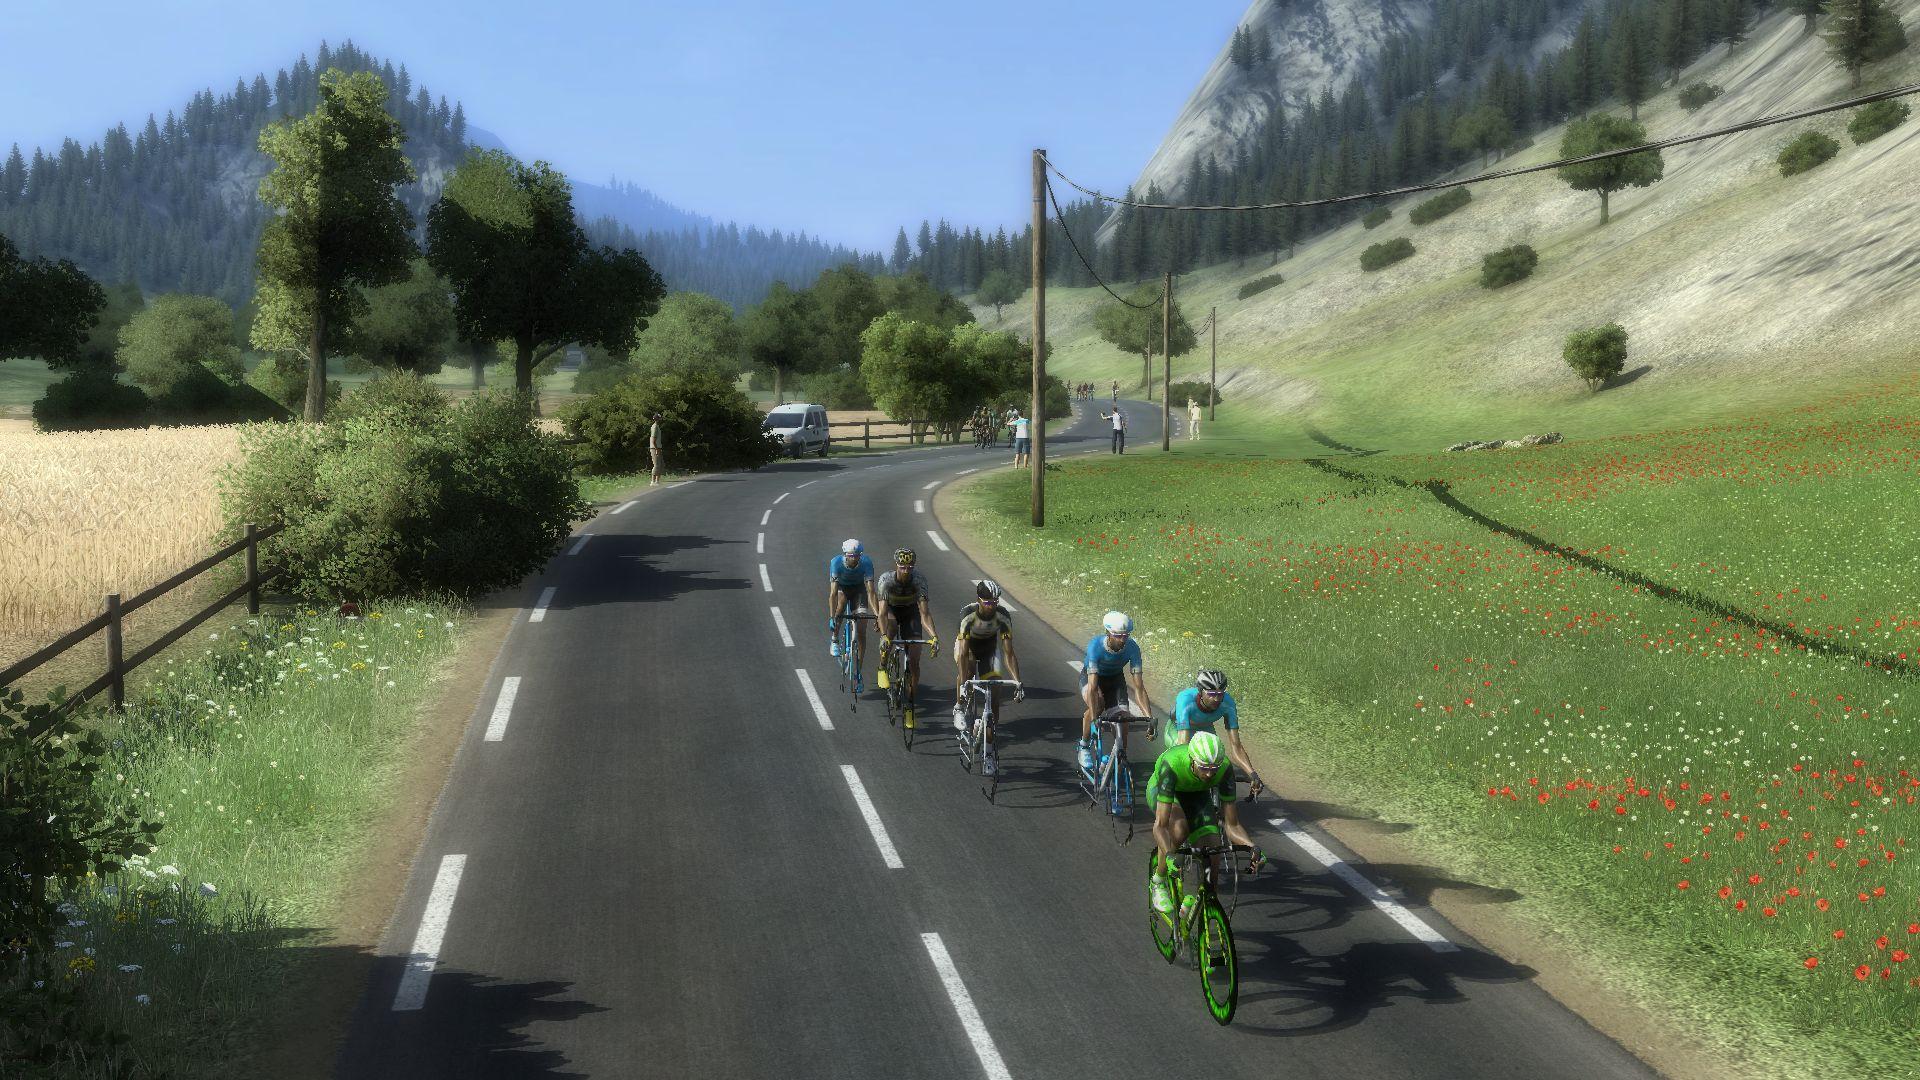 pcmdaily.com/images/mg/2017/Races/U23/Avenir/AVES7%2014.jpg